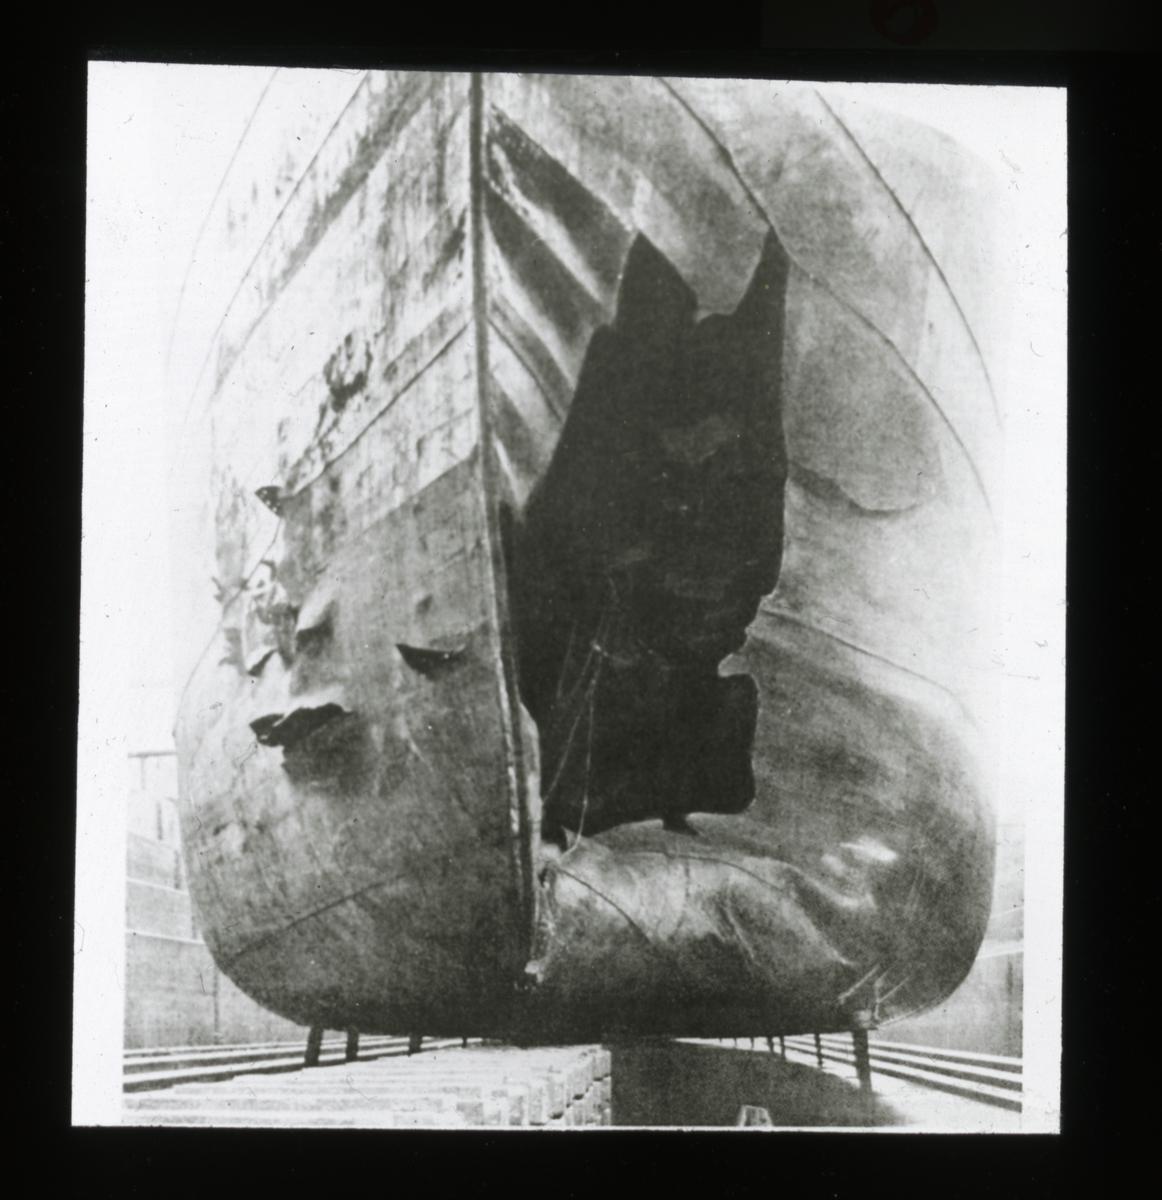 D/T 'Belridge'(b.1914, Sir James & Sons Ltd., Sunderland) - torpedert.